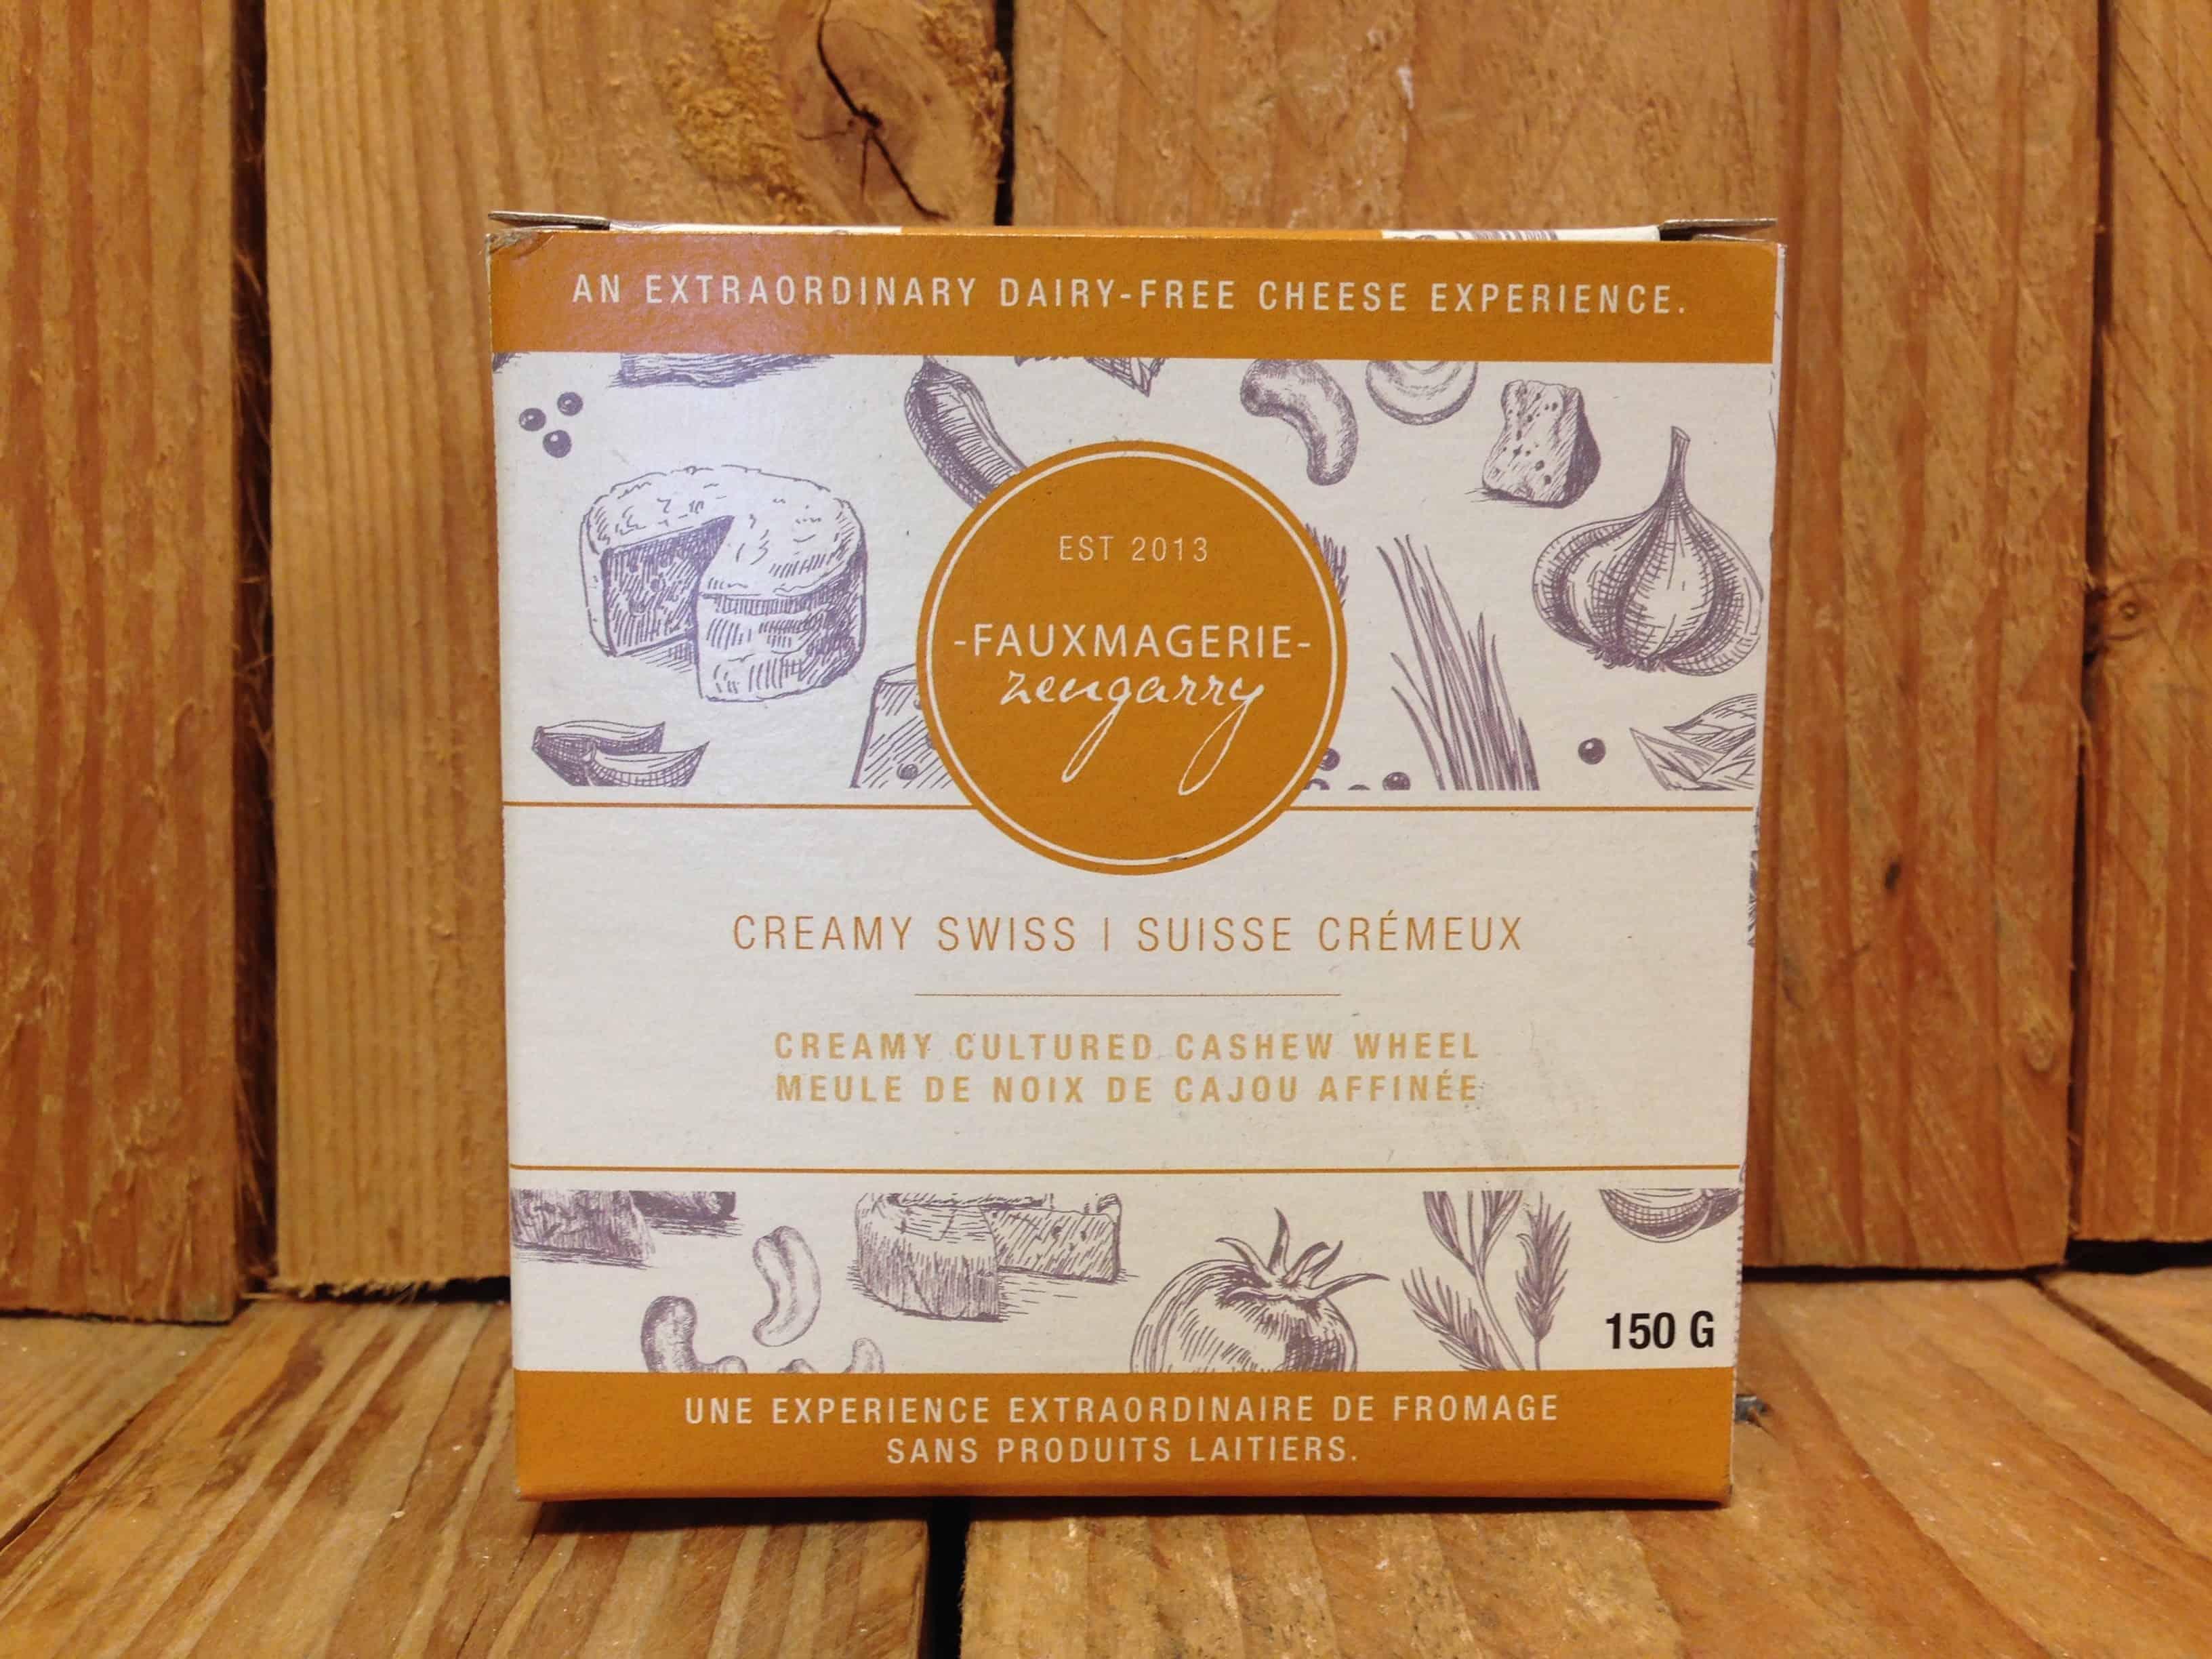 Fauxmagerie Zengarry – Cashew Cheese – Creamy Swiss (150g)